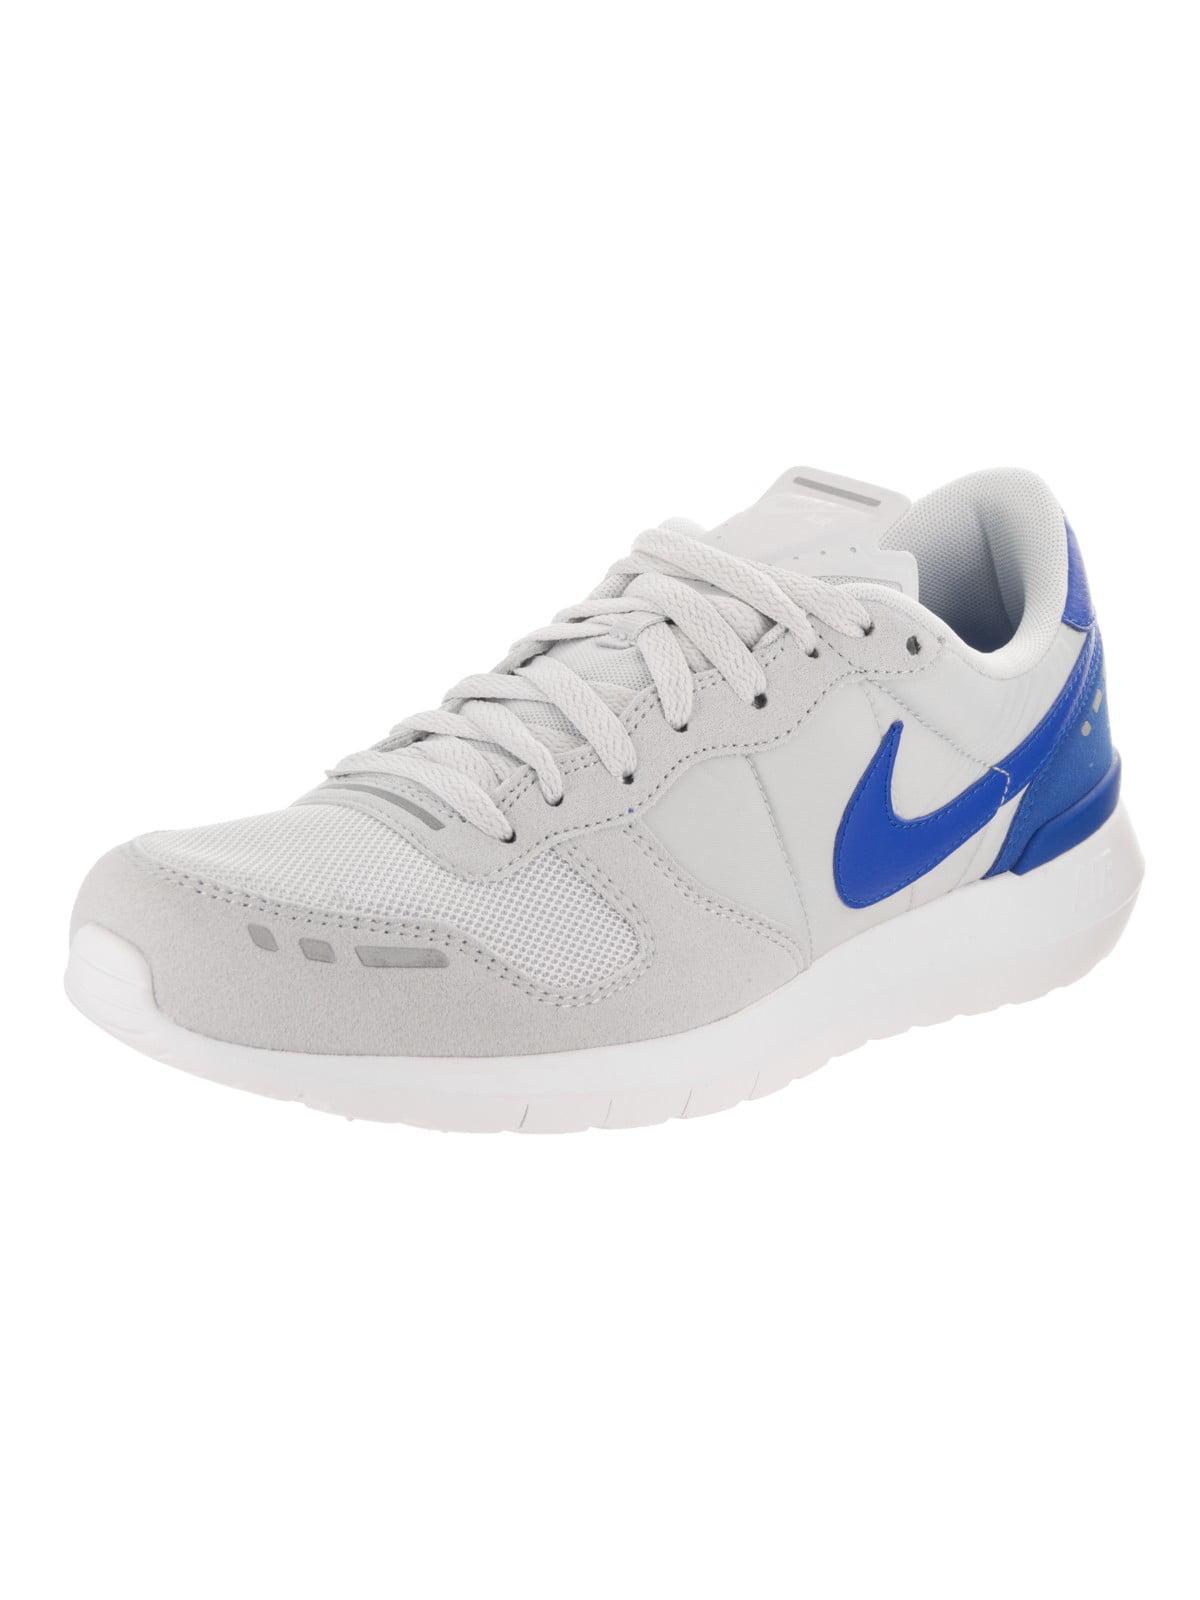 Nike Men's Air Vrtx '17 Running Shoe - Walmart.com